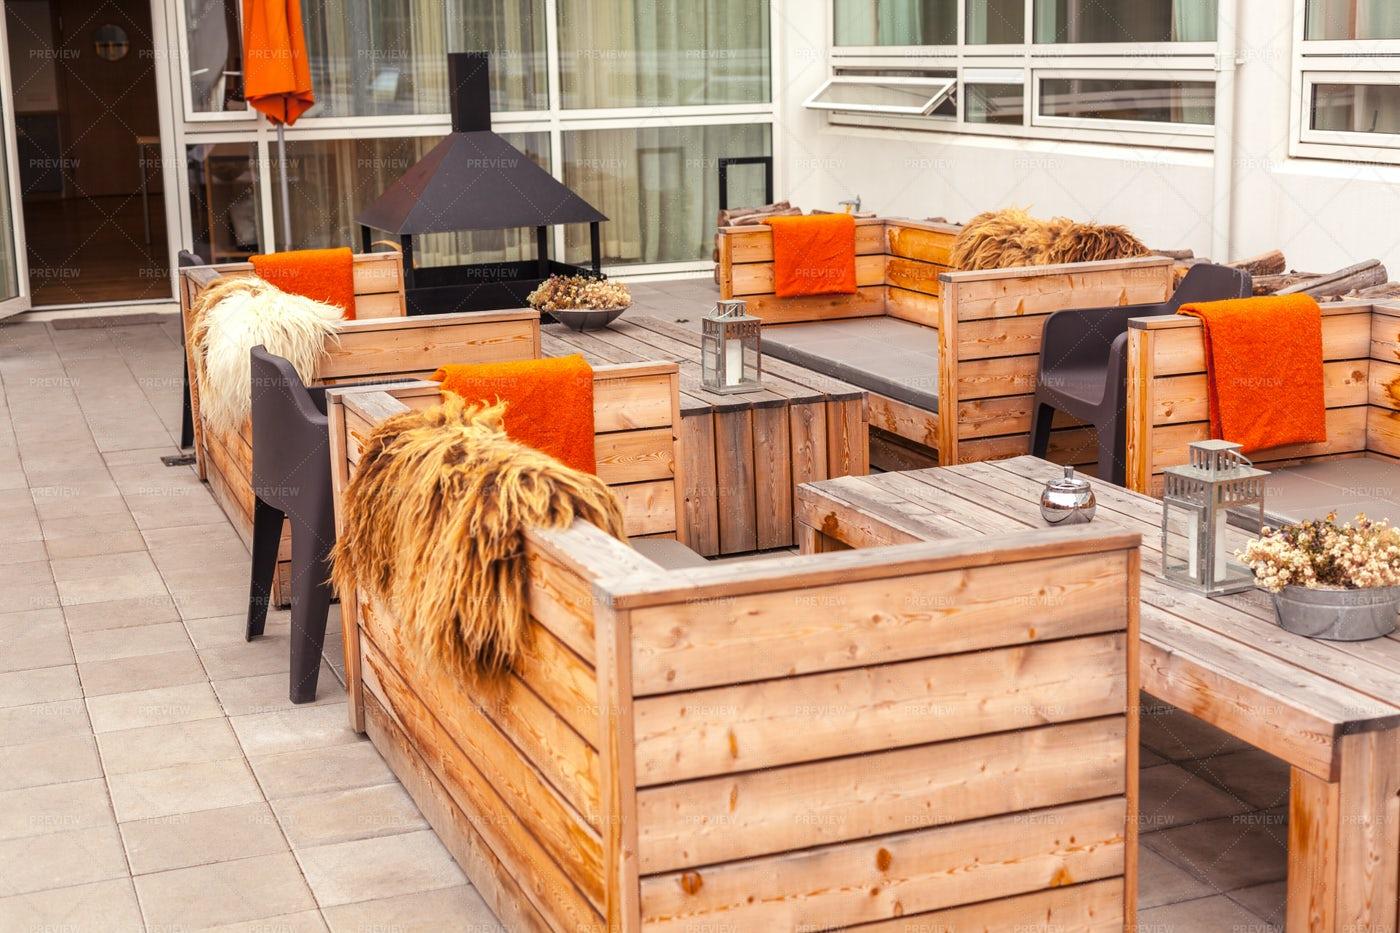 Outdoor Restaurant Terrace: Stock Photos